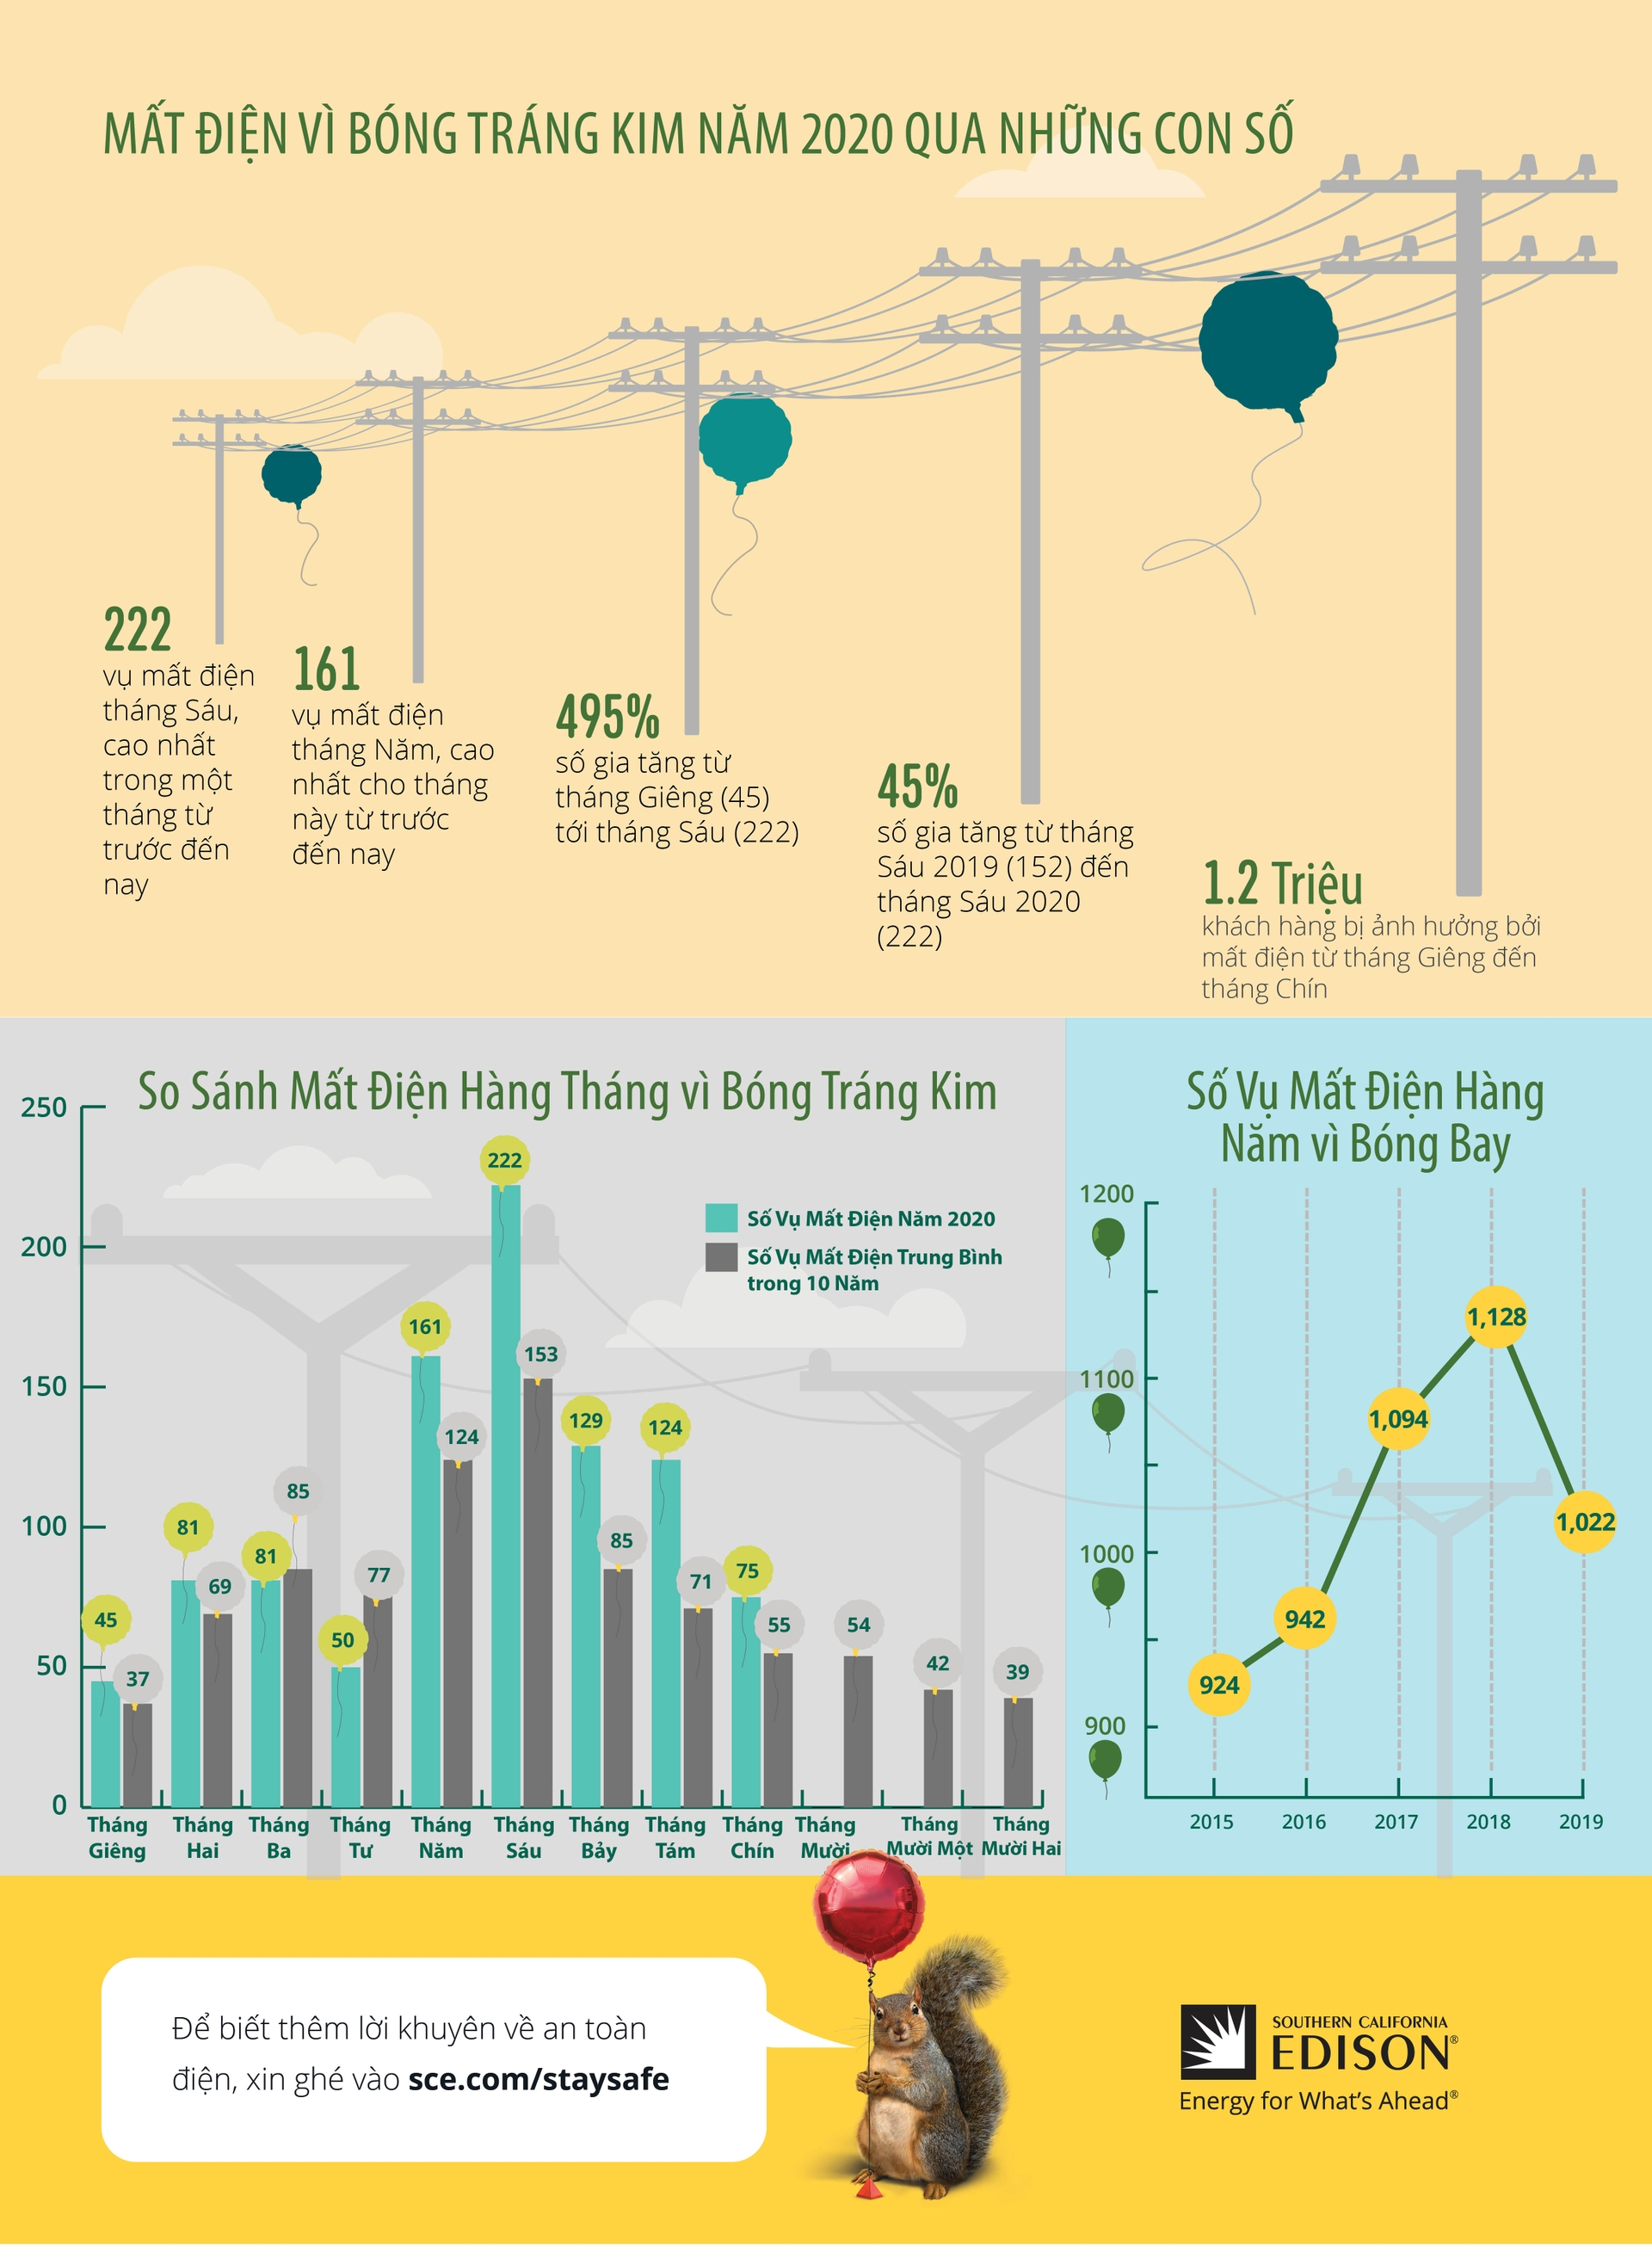 G20-208 Metallic Balloon Infographic_VI